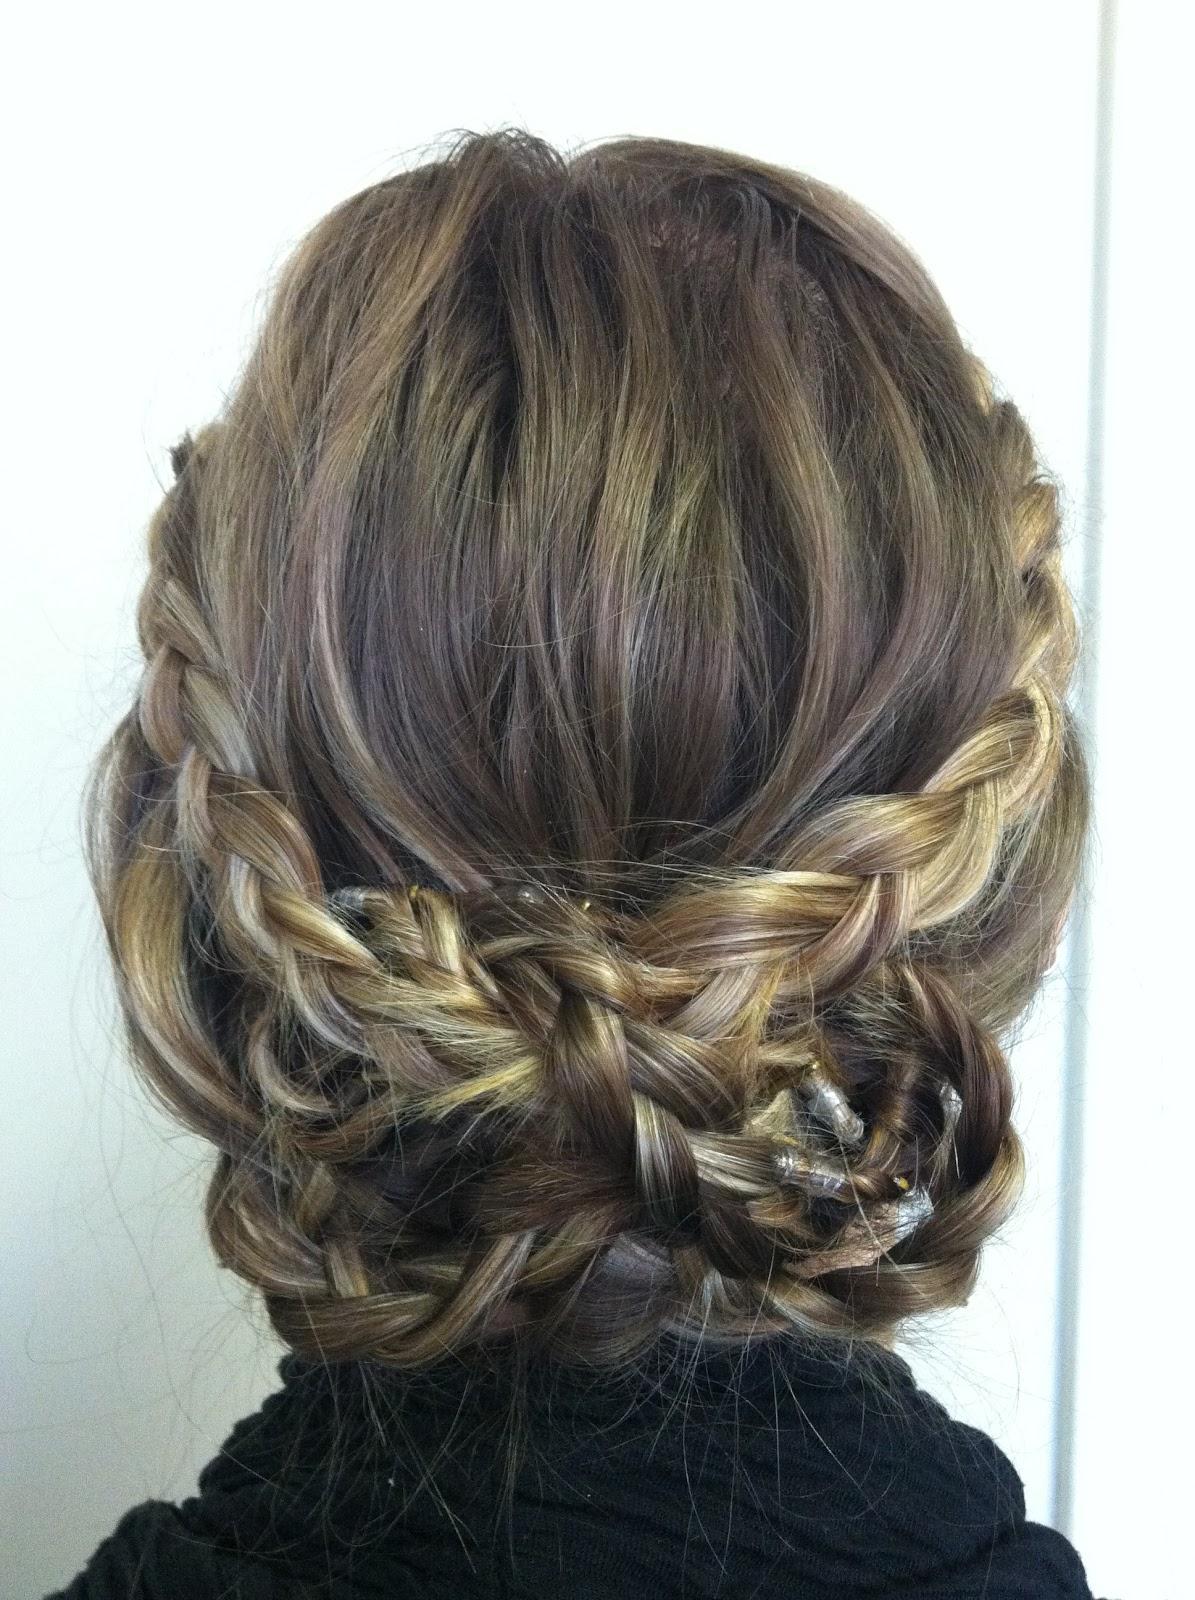 Bye Bye Beehive │ A Hairstyle Blog: The Braided Bun